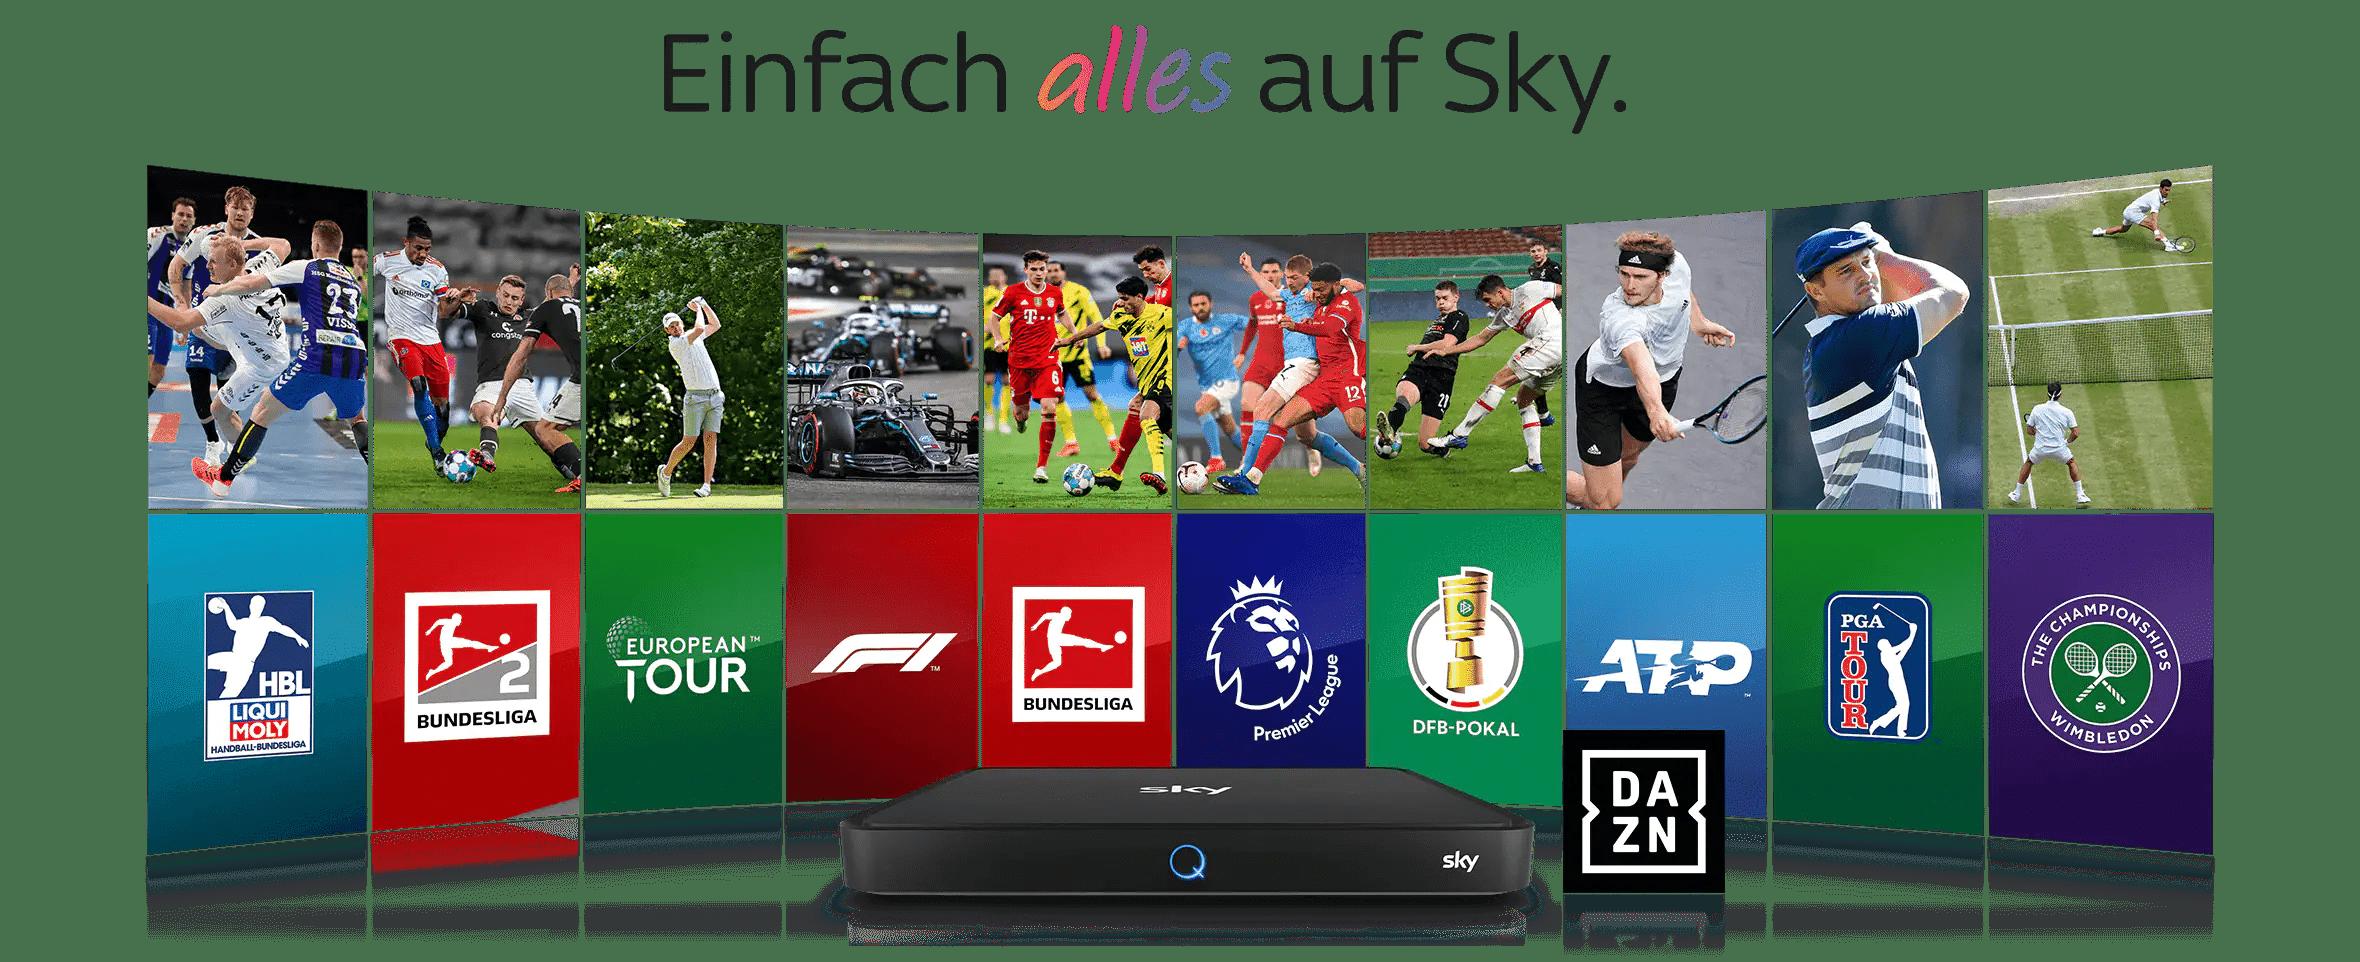 sky-sport-angebot-2021-22